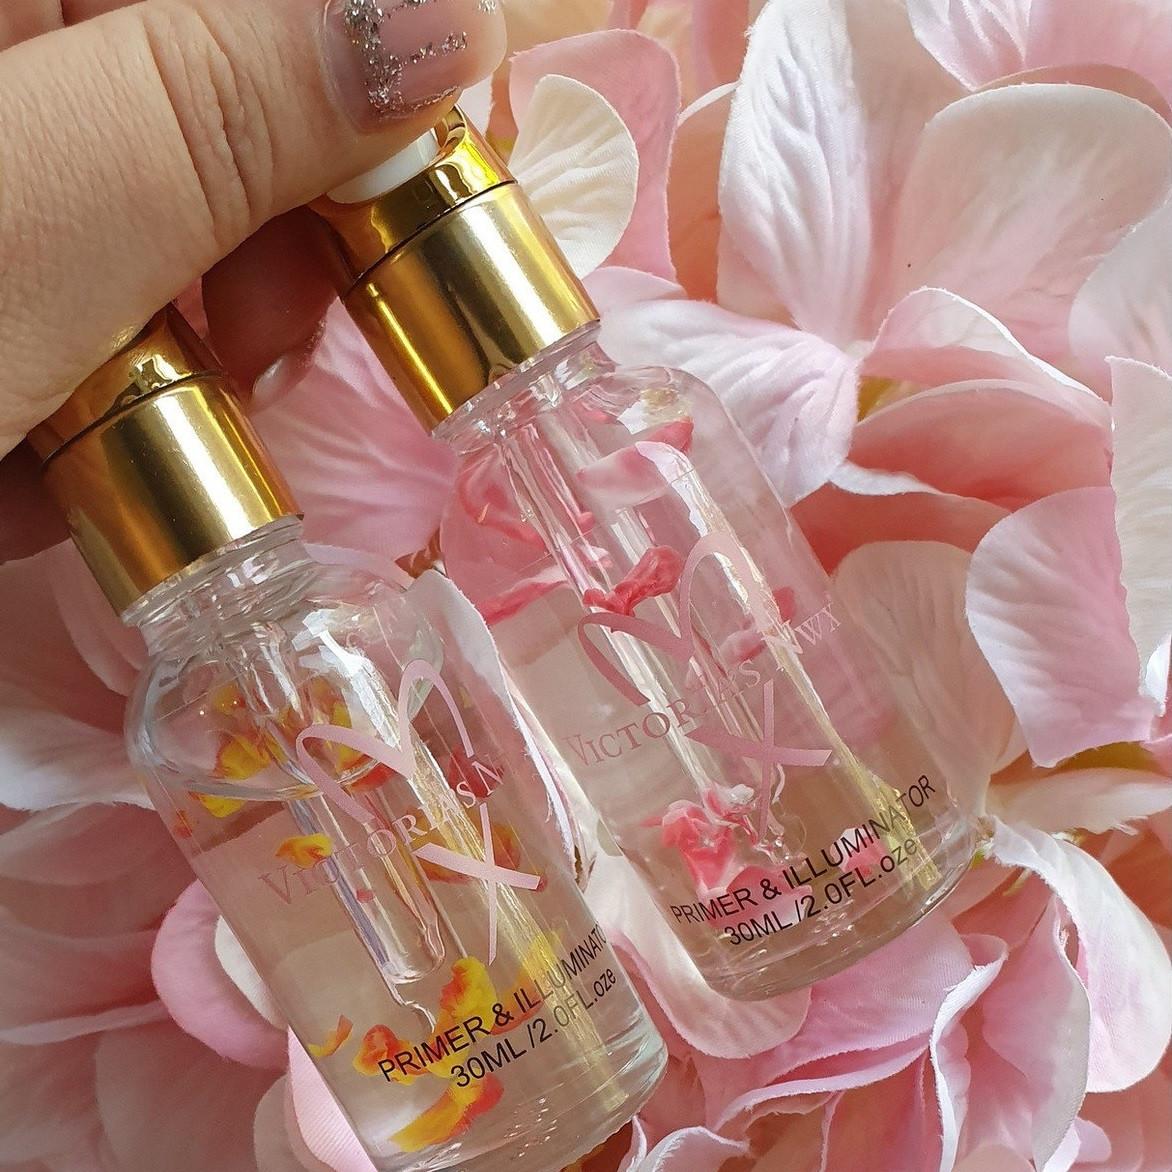 Праймер для лица с лепестками роз Victoria's NWX Pure Radiance Glowrized + Jojoba Oil 30 мл